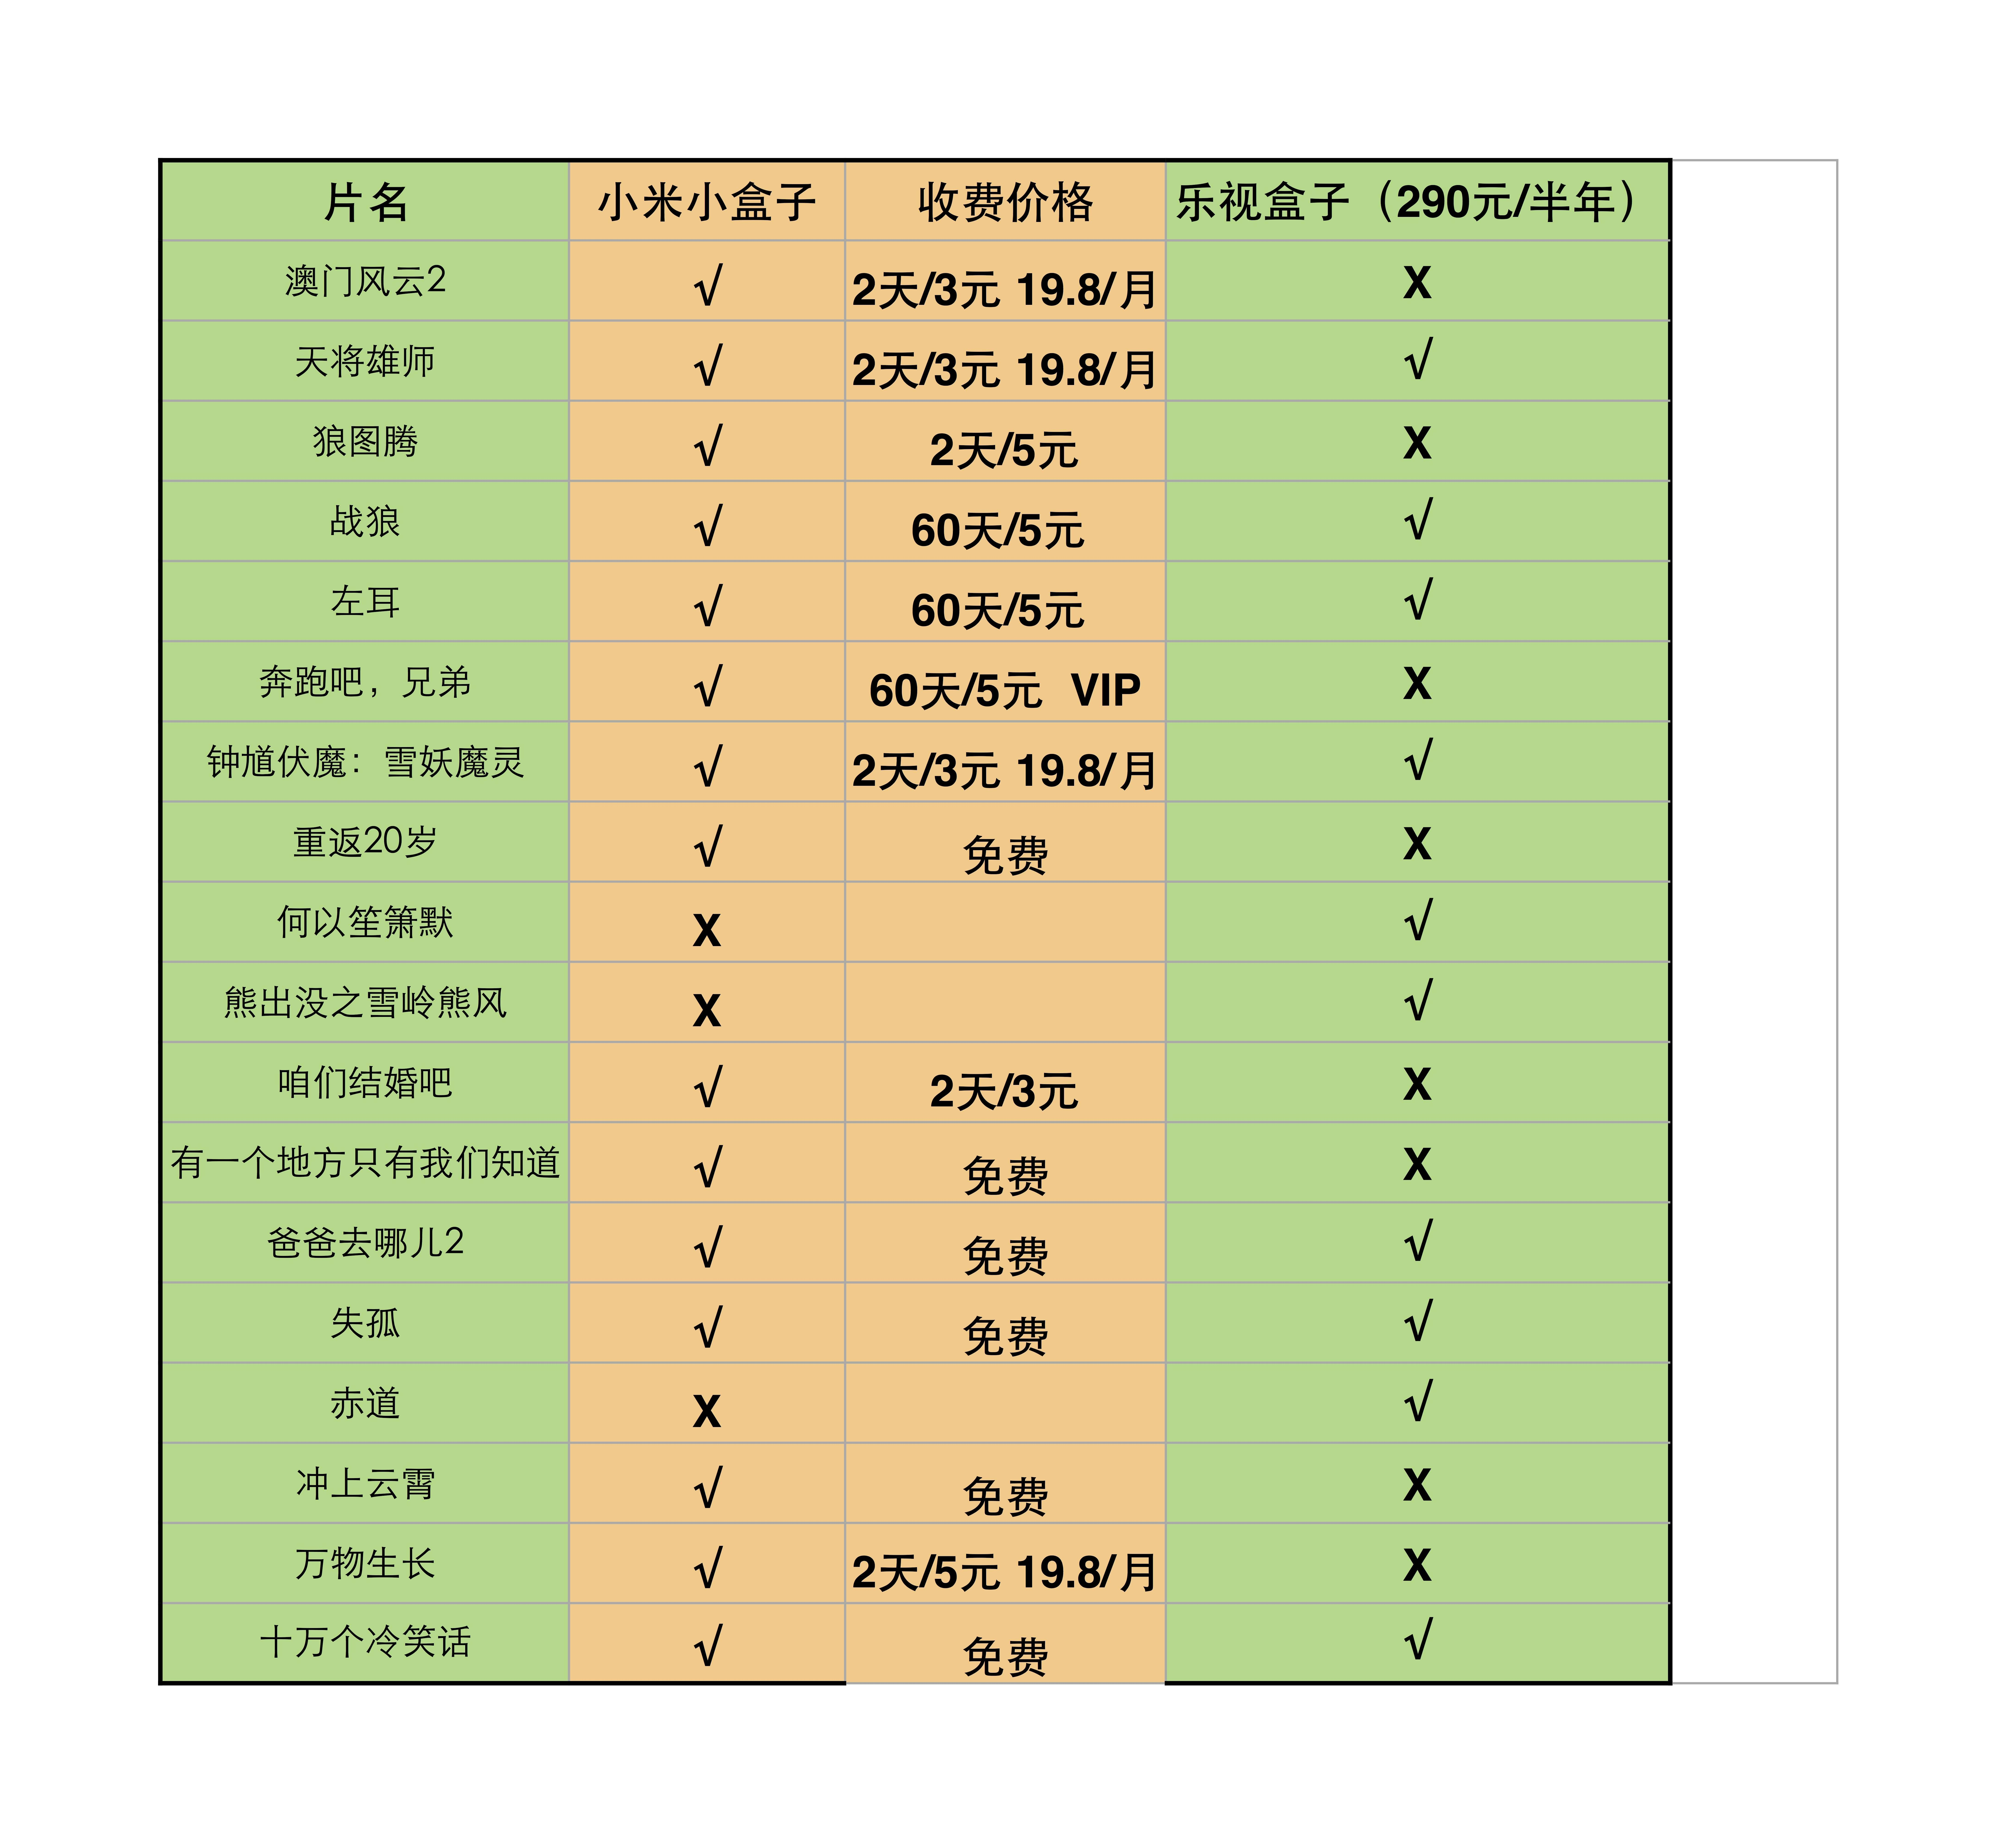 xiaomi-letv-who-is-best-4